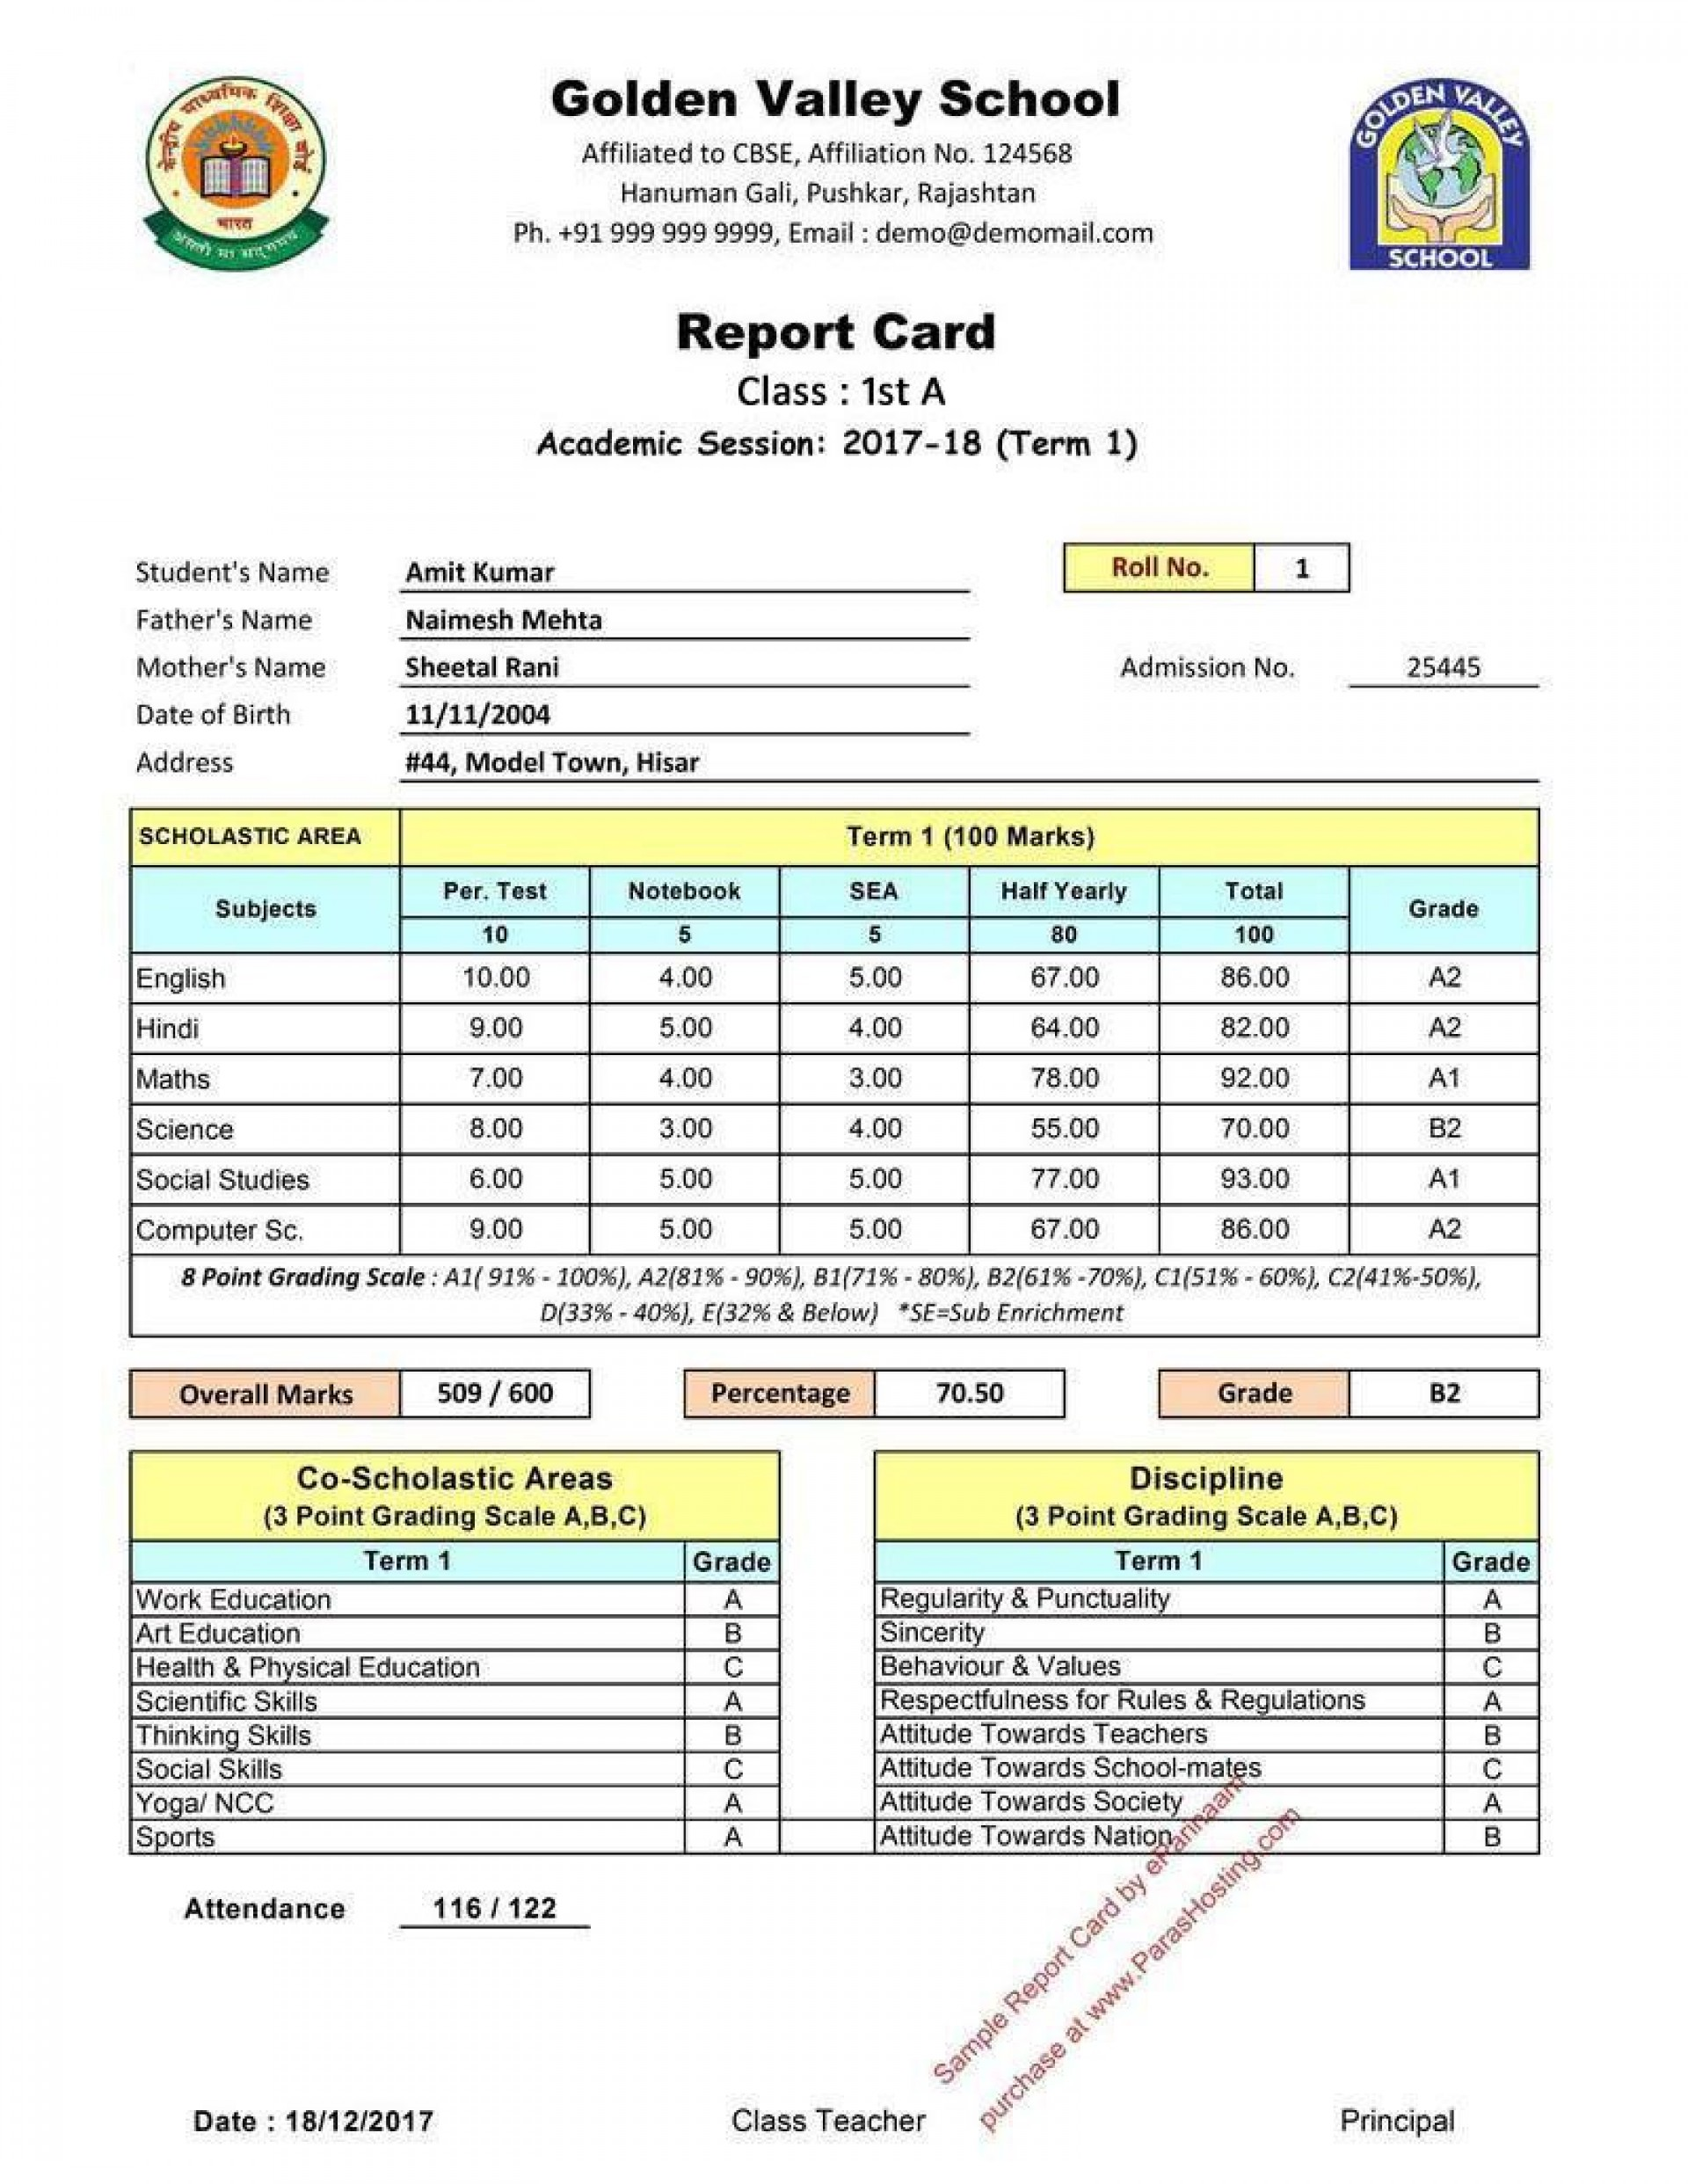 005 Stunning Homeschool Middle School Report Card Template Highest Clarity  8th Grade Transcript1920